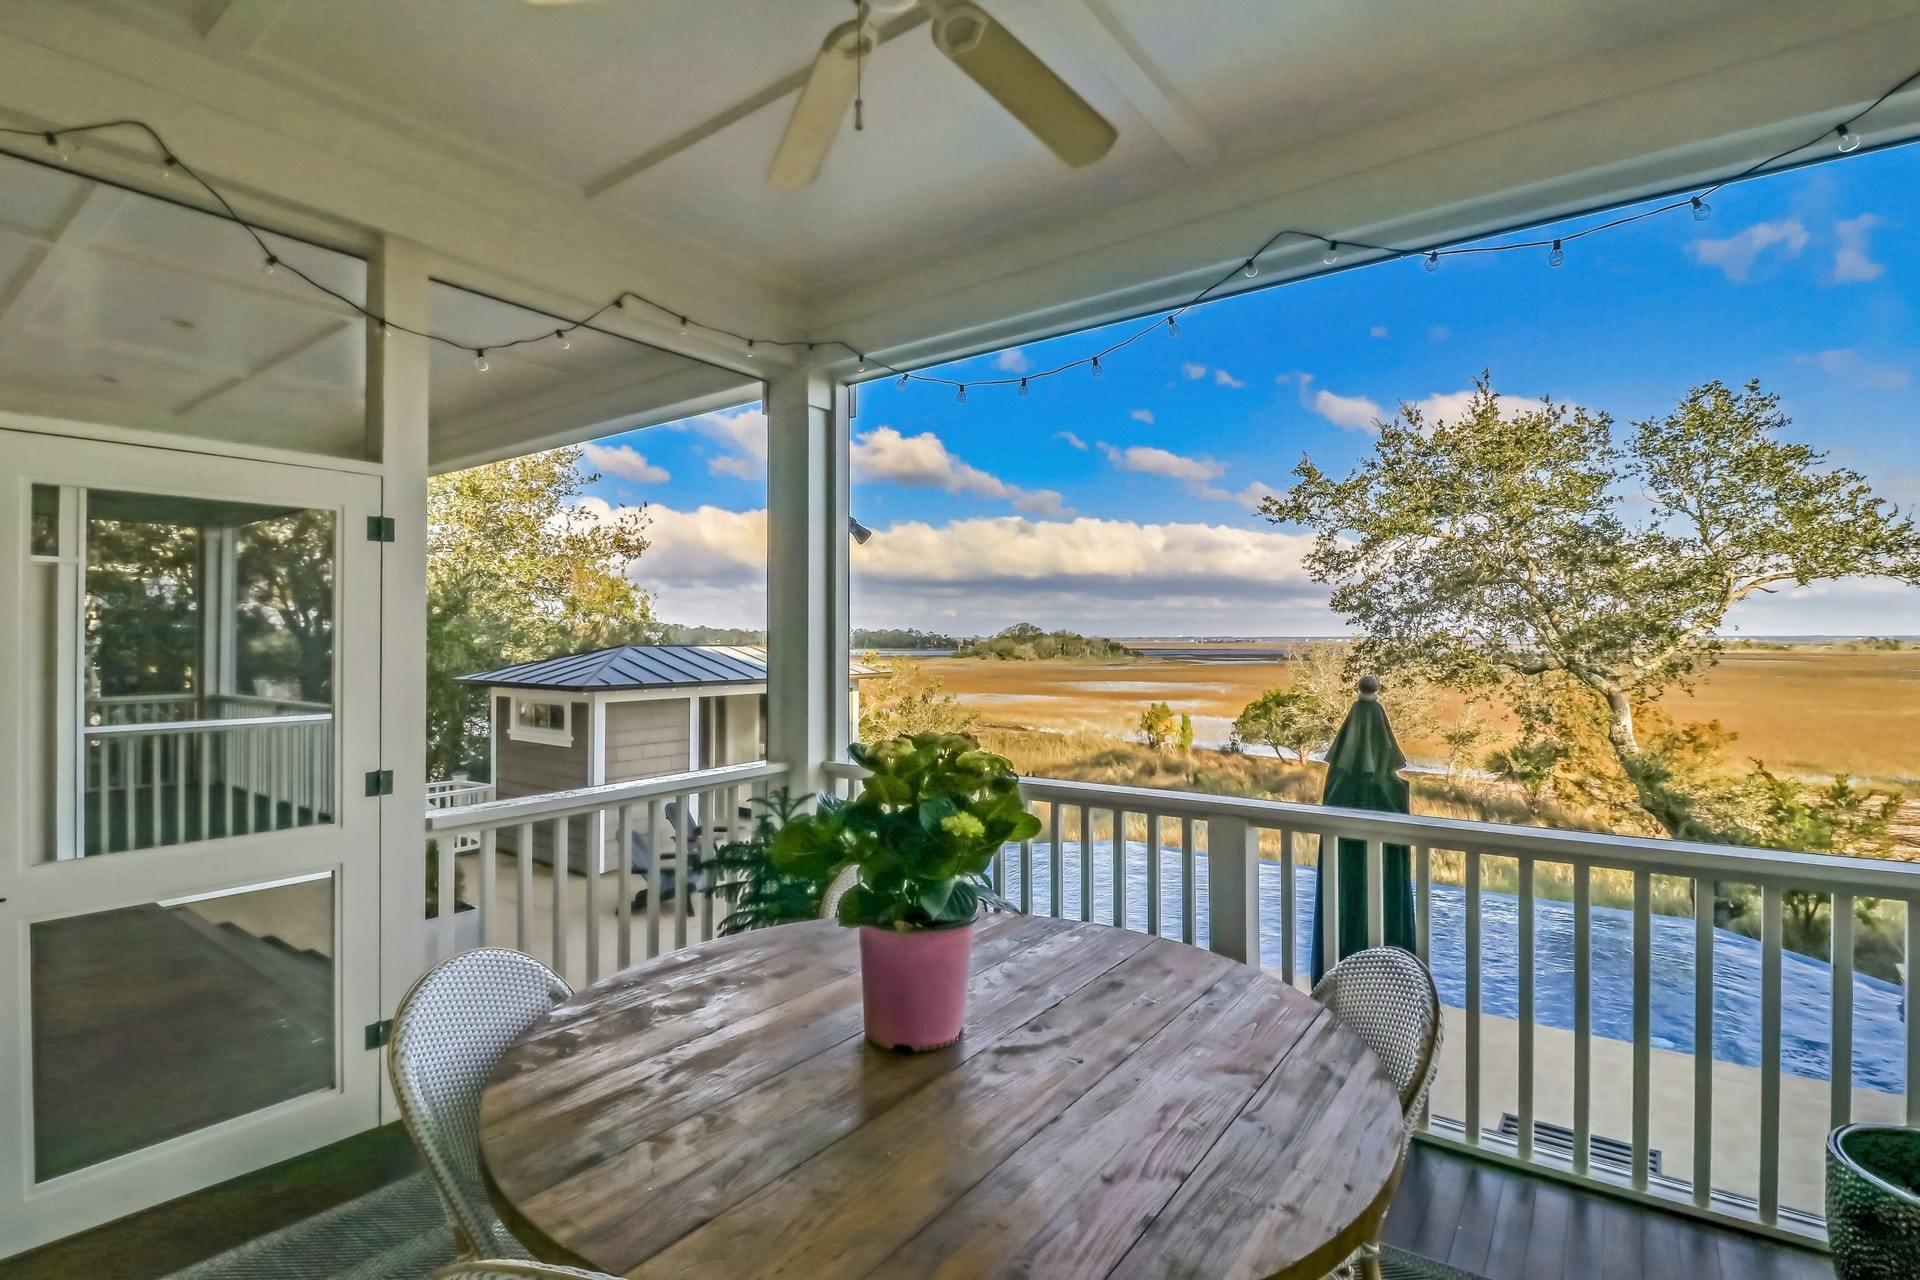 Waterway Island Homes For Sale - 7 Waterway Island Drive, Isle of Palms, SC - 20